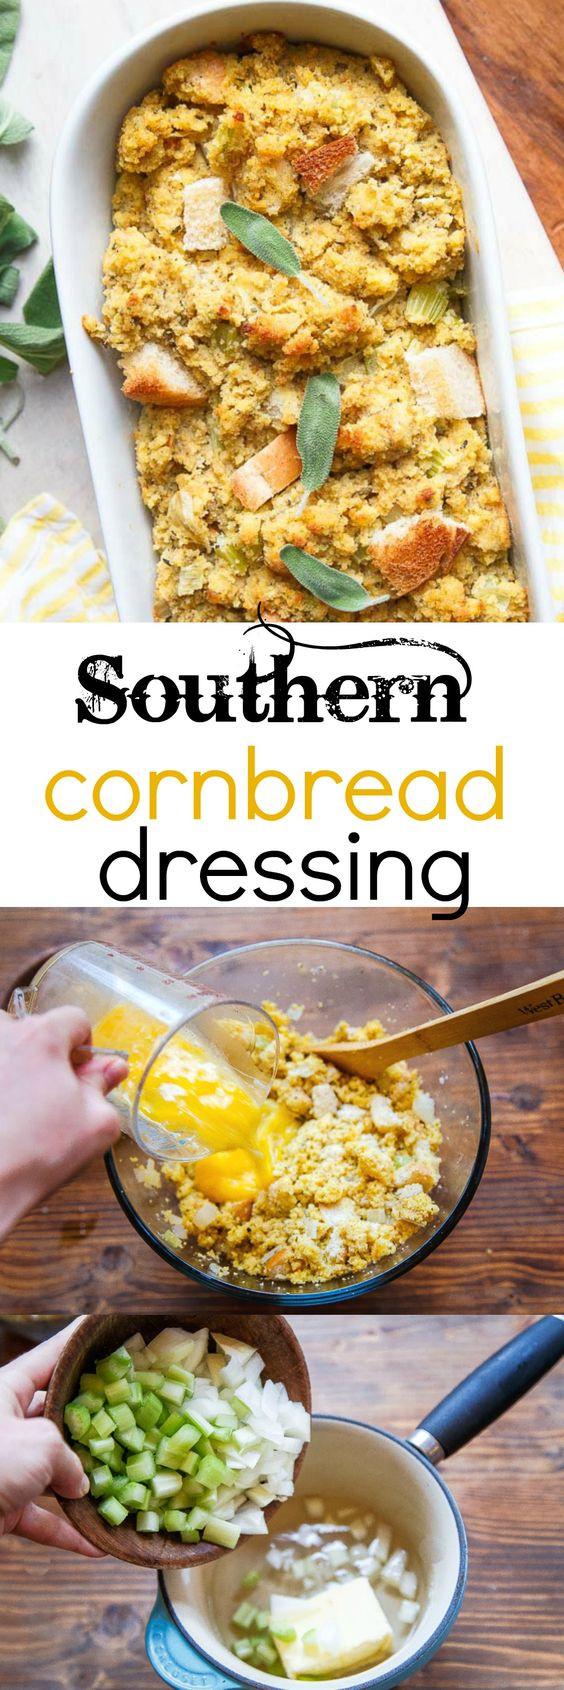 Best Southern Cornbread Recipe  A Small Thanksgiving Southern Cornbread Dressing